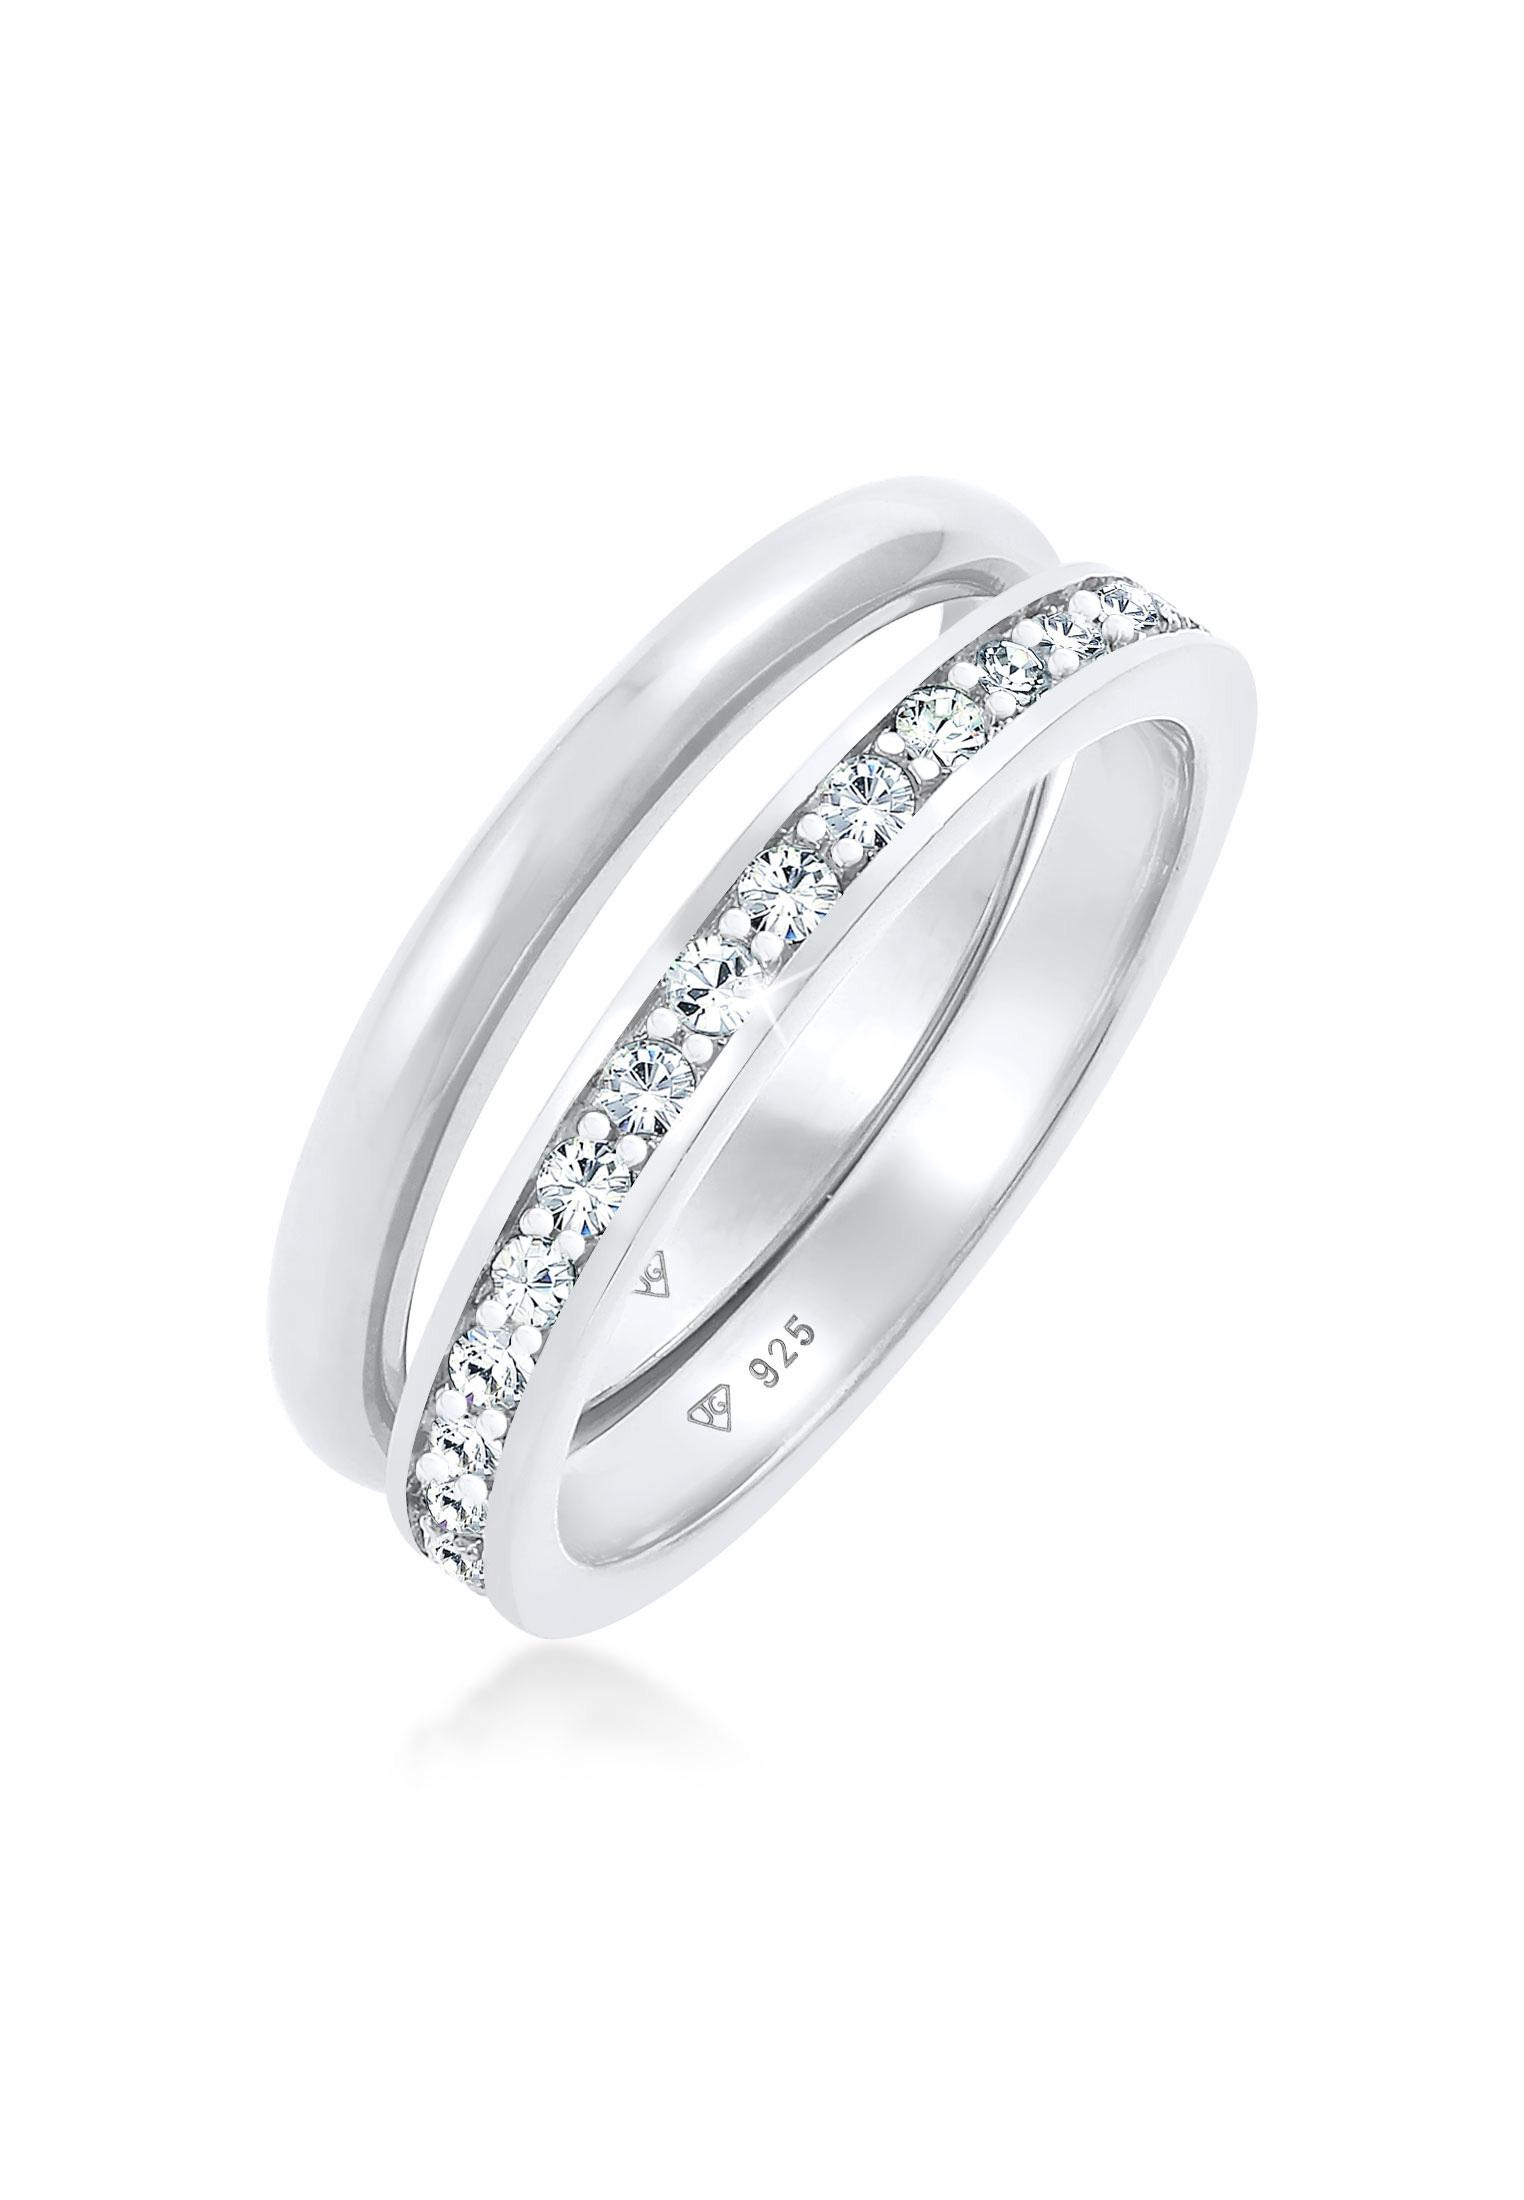 Bandring | Kristall ( Weiß ) | 925er Sterling Silber